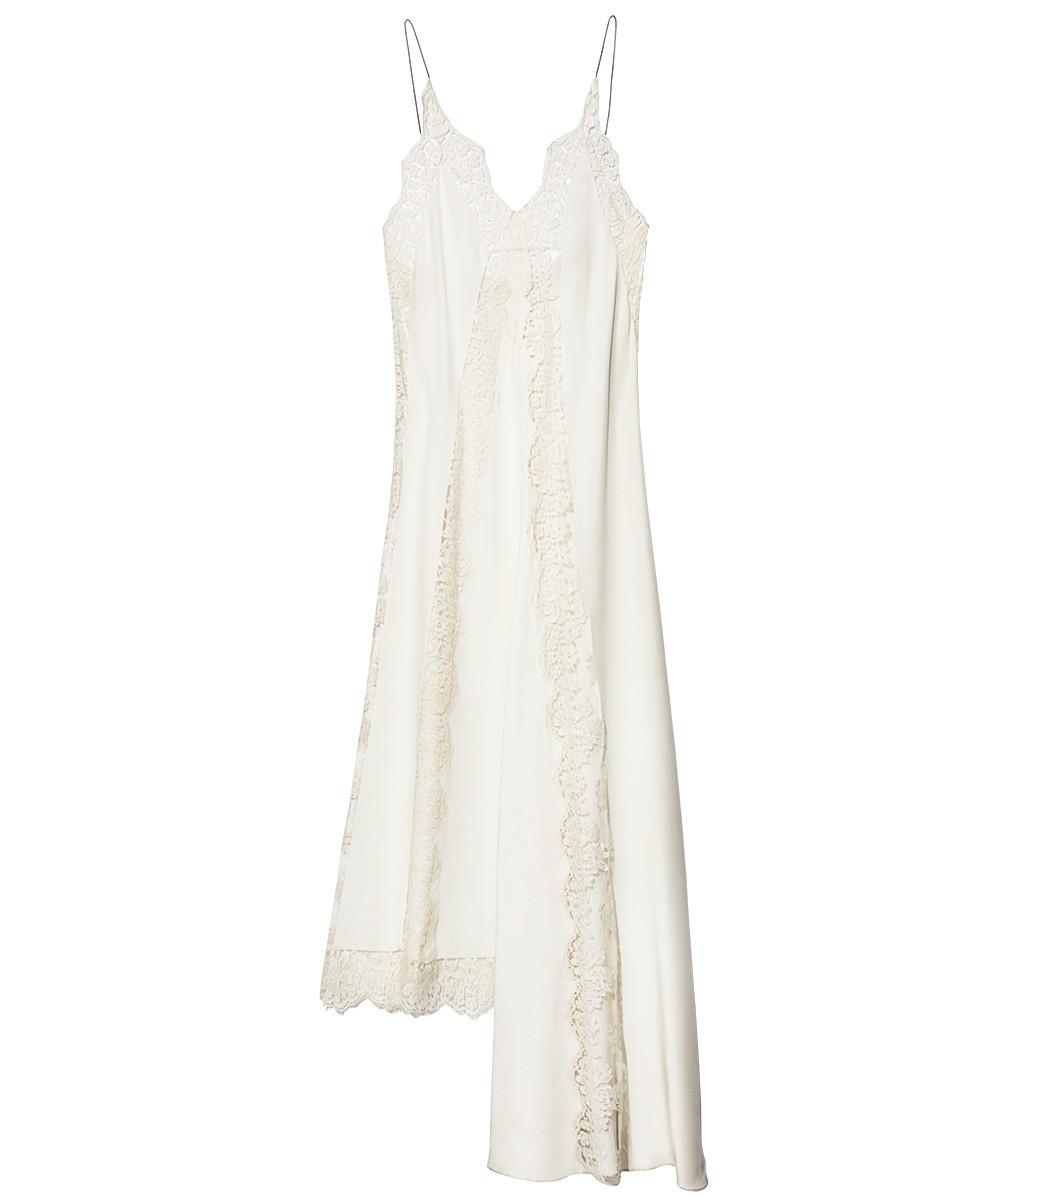 STELLA MCCARTNEY Angie Marocaine V-Neck Sleeveless Silk Lace Cami Dress